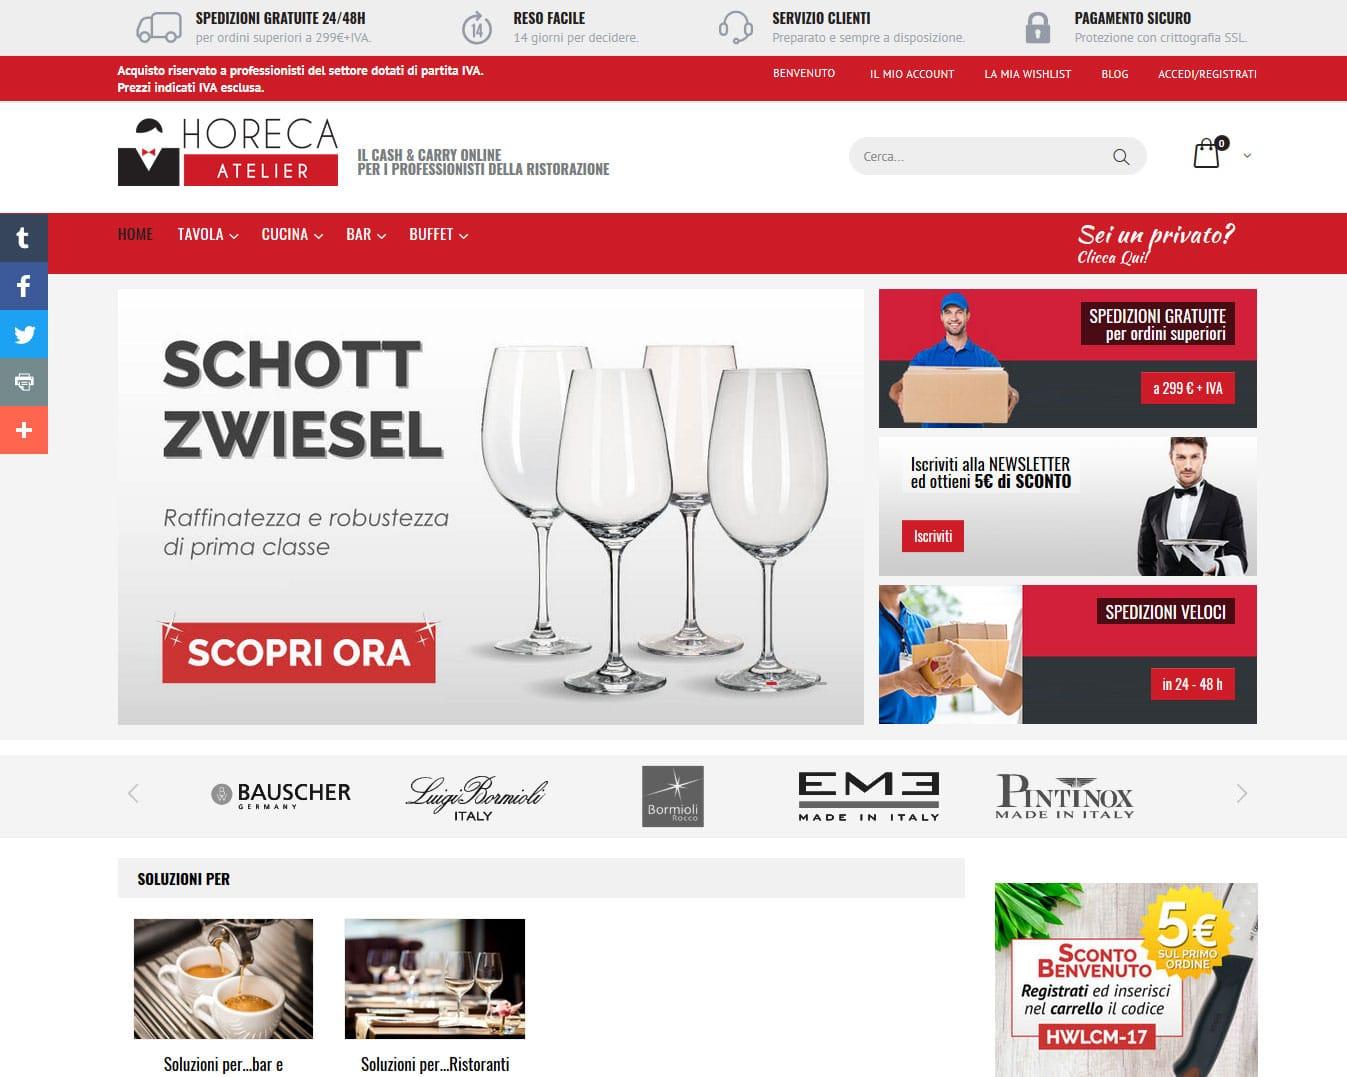 Horeca Atelier eCommerce